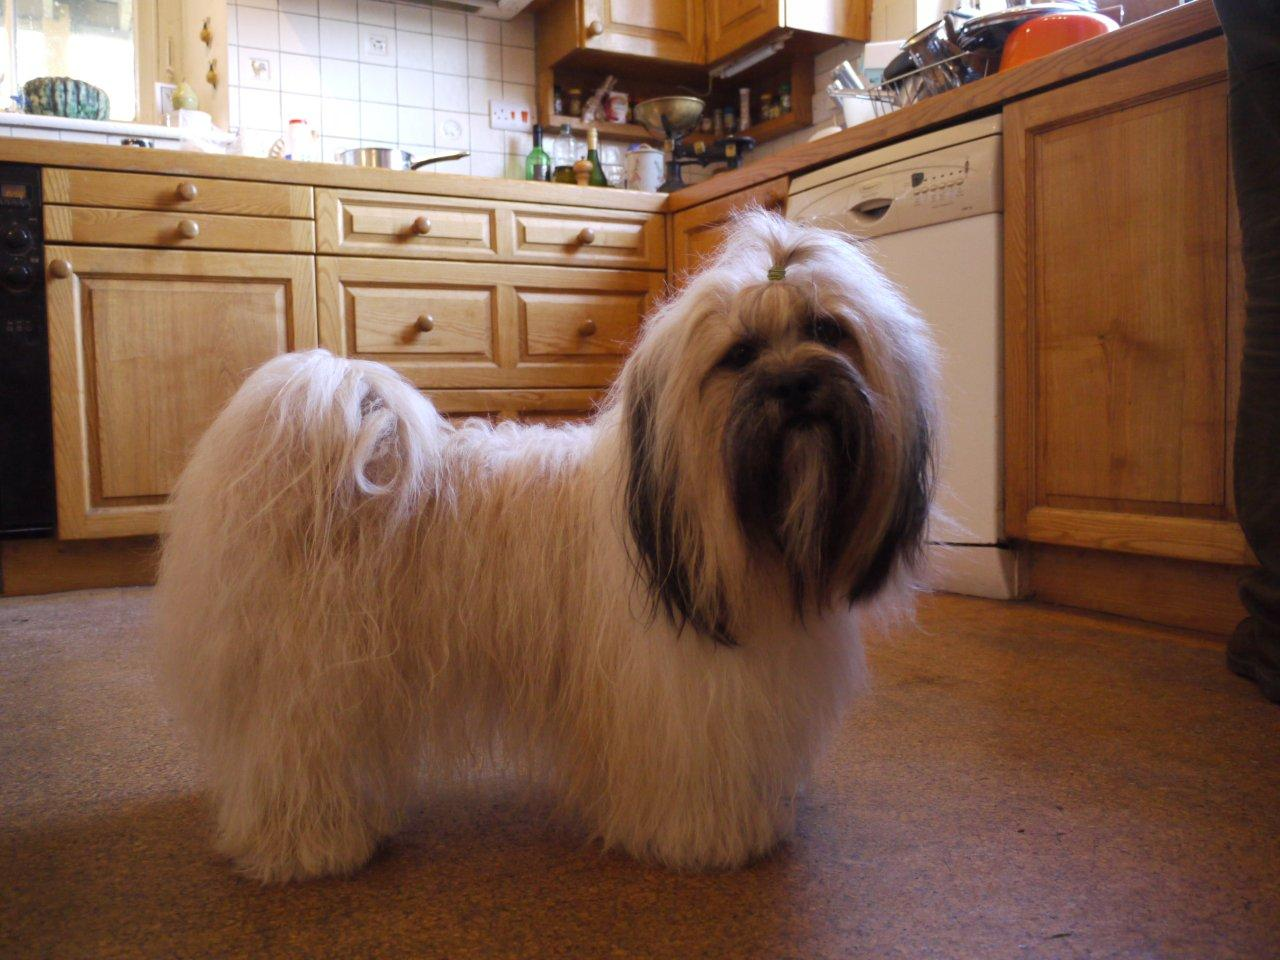 Otto, freshly groomed